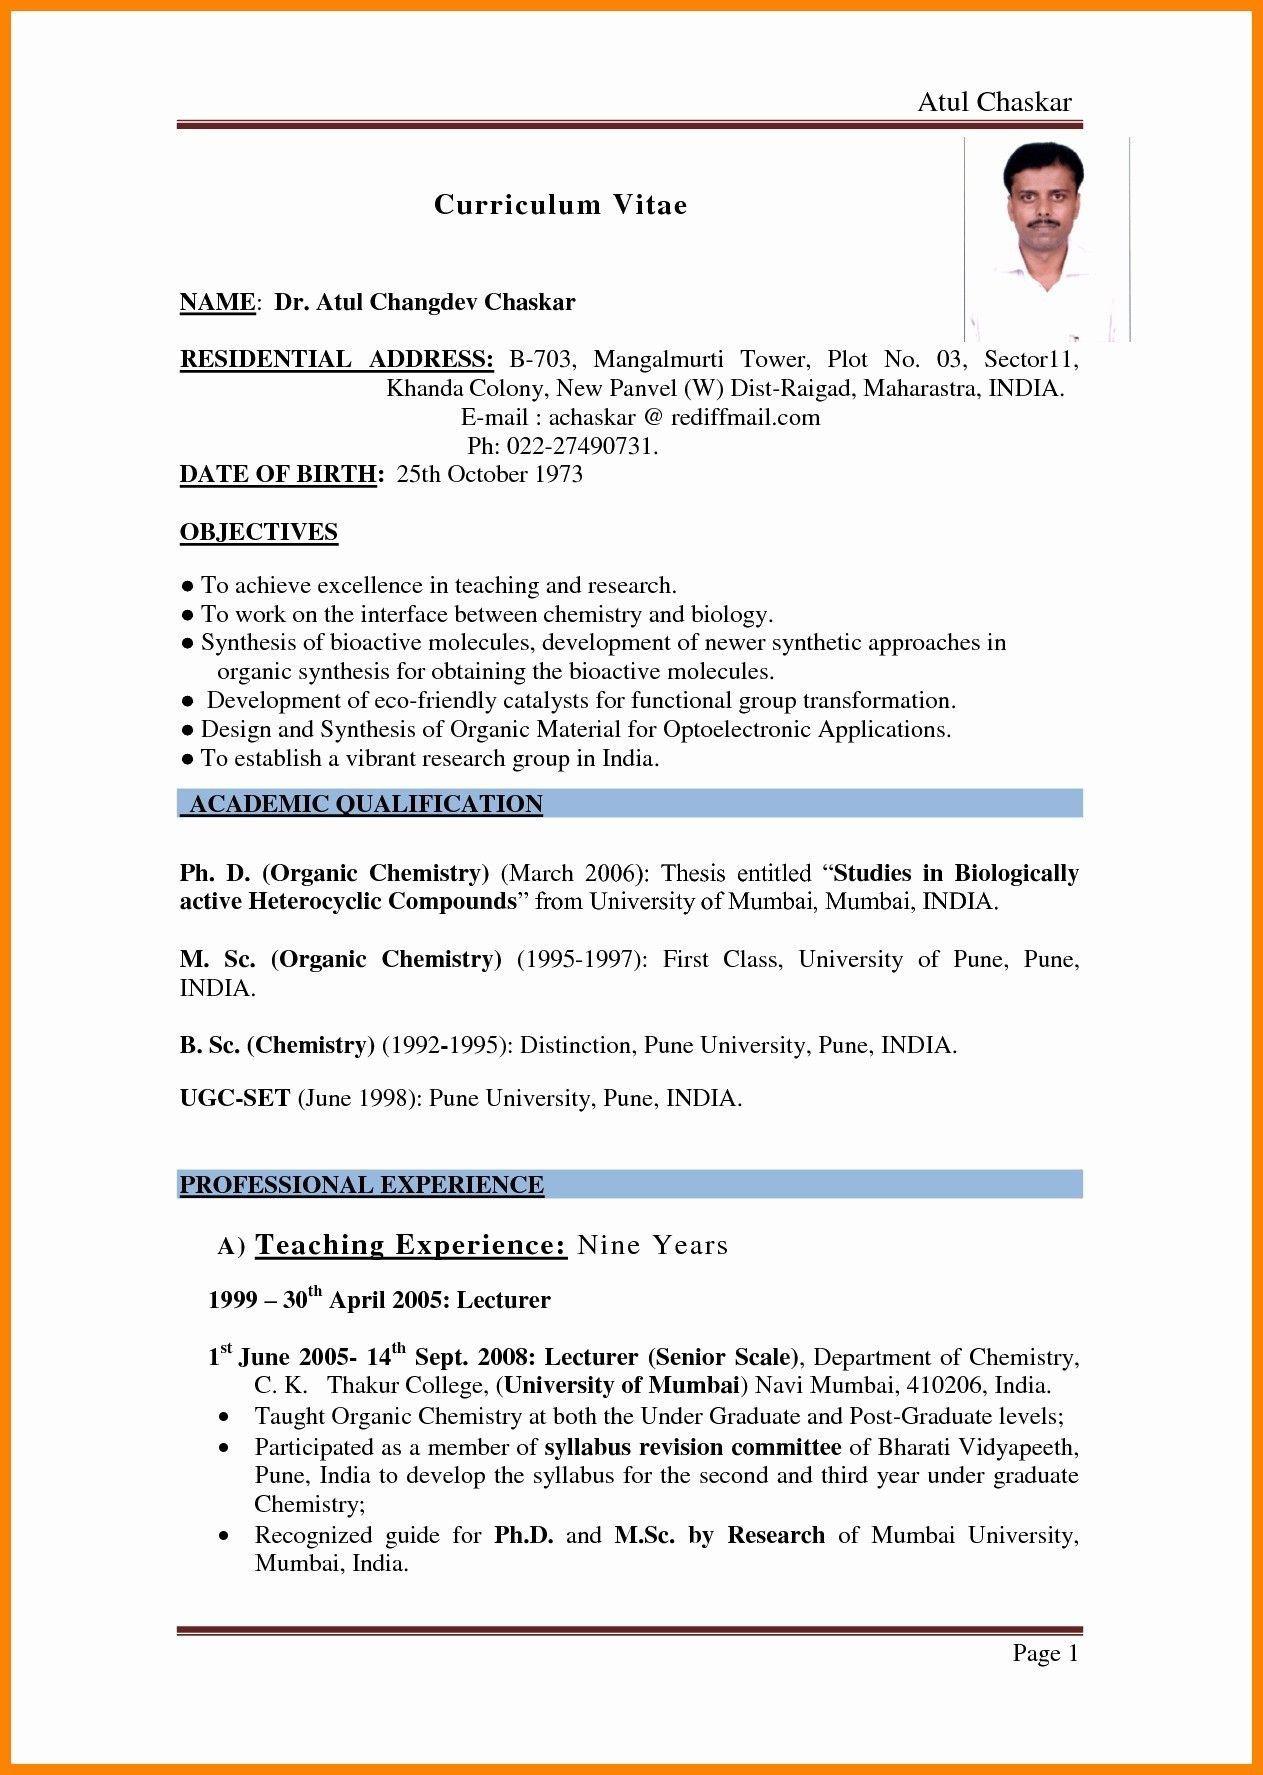 001 Beautiful Resume Sample For Teaching Job In India Image  School Principal PositionFull